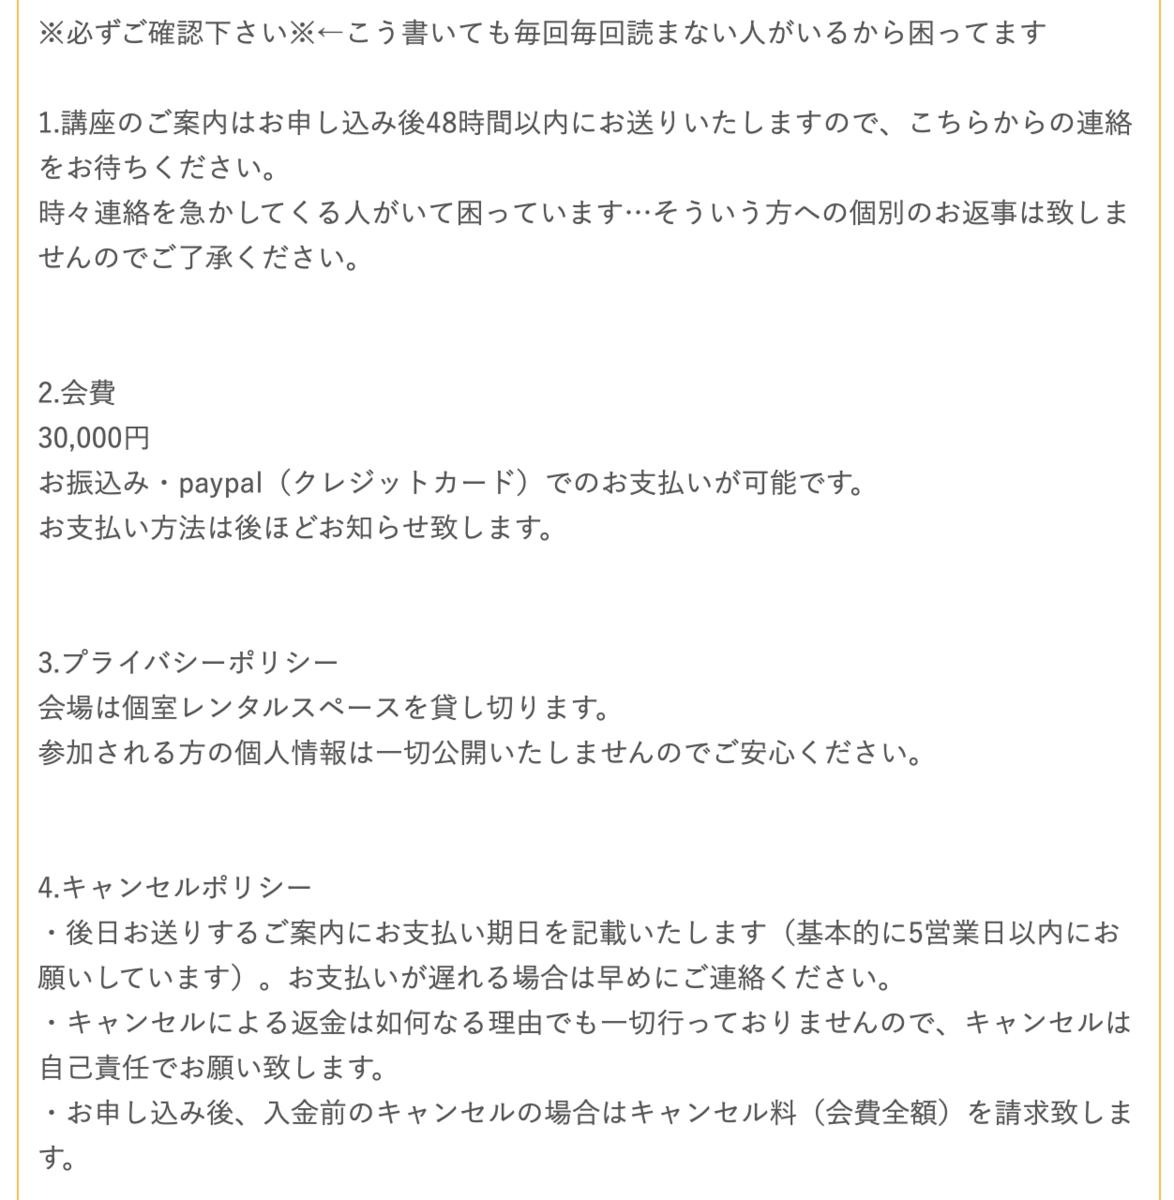 f:id:gen-ron:20200723143254p:plain